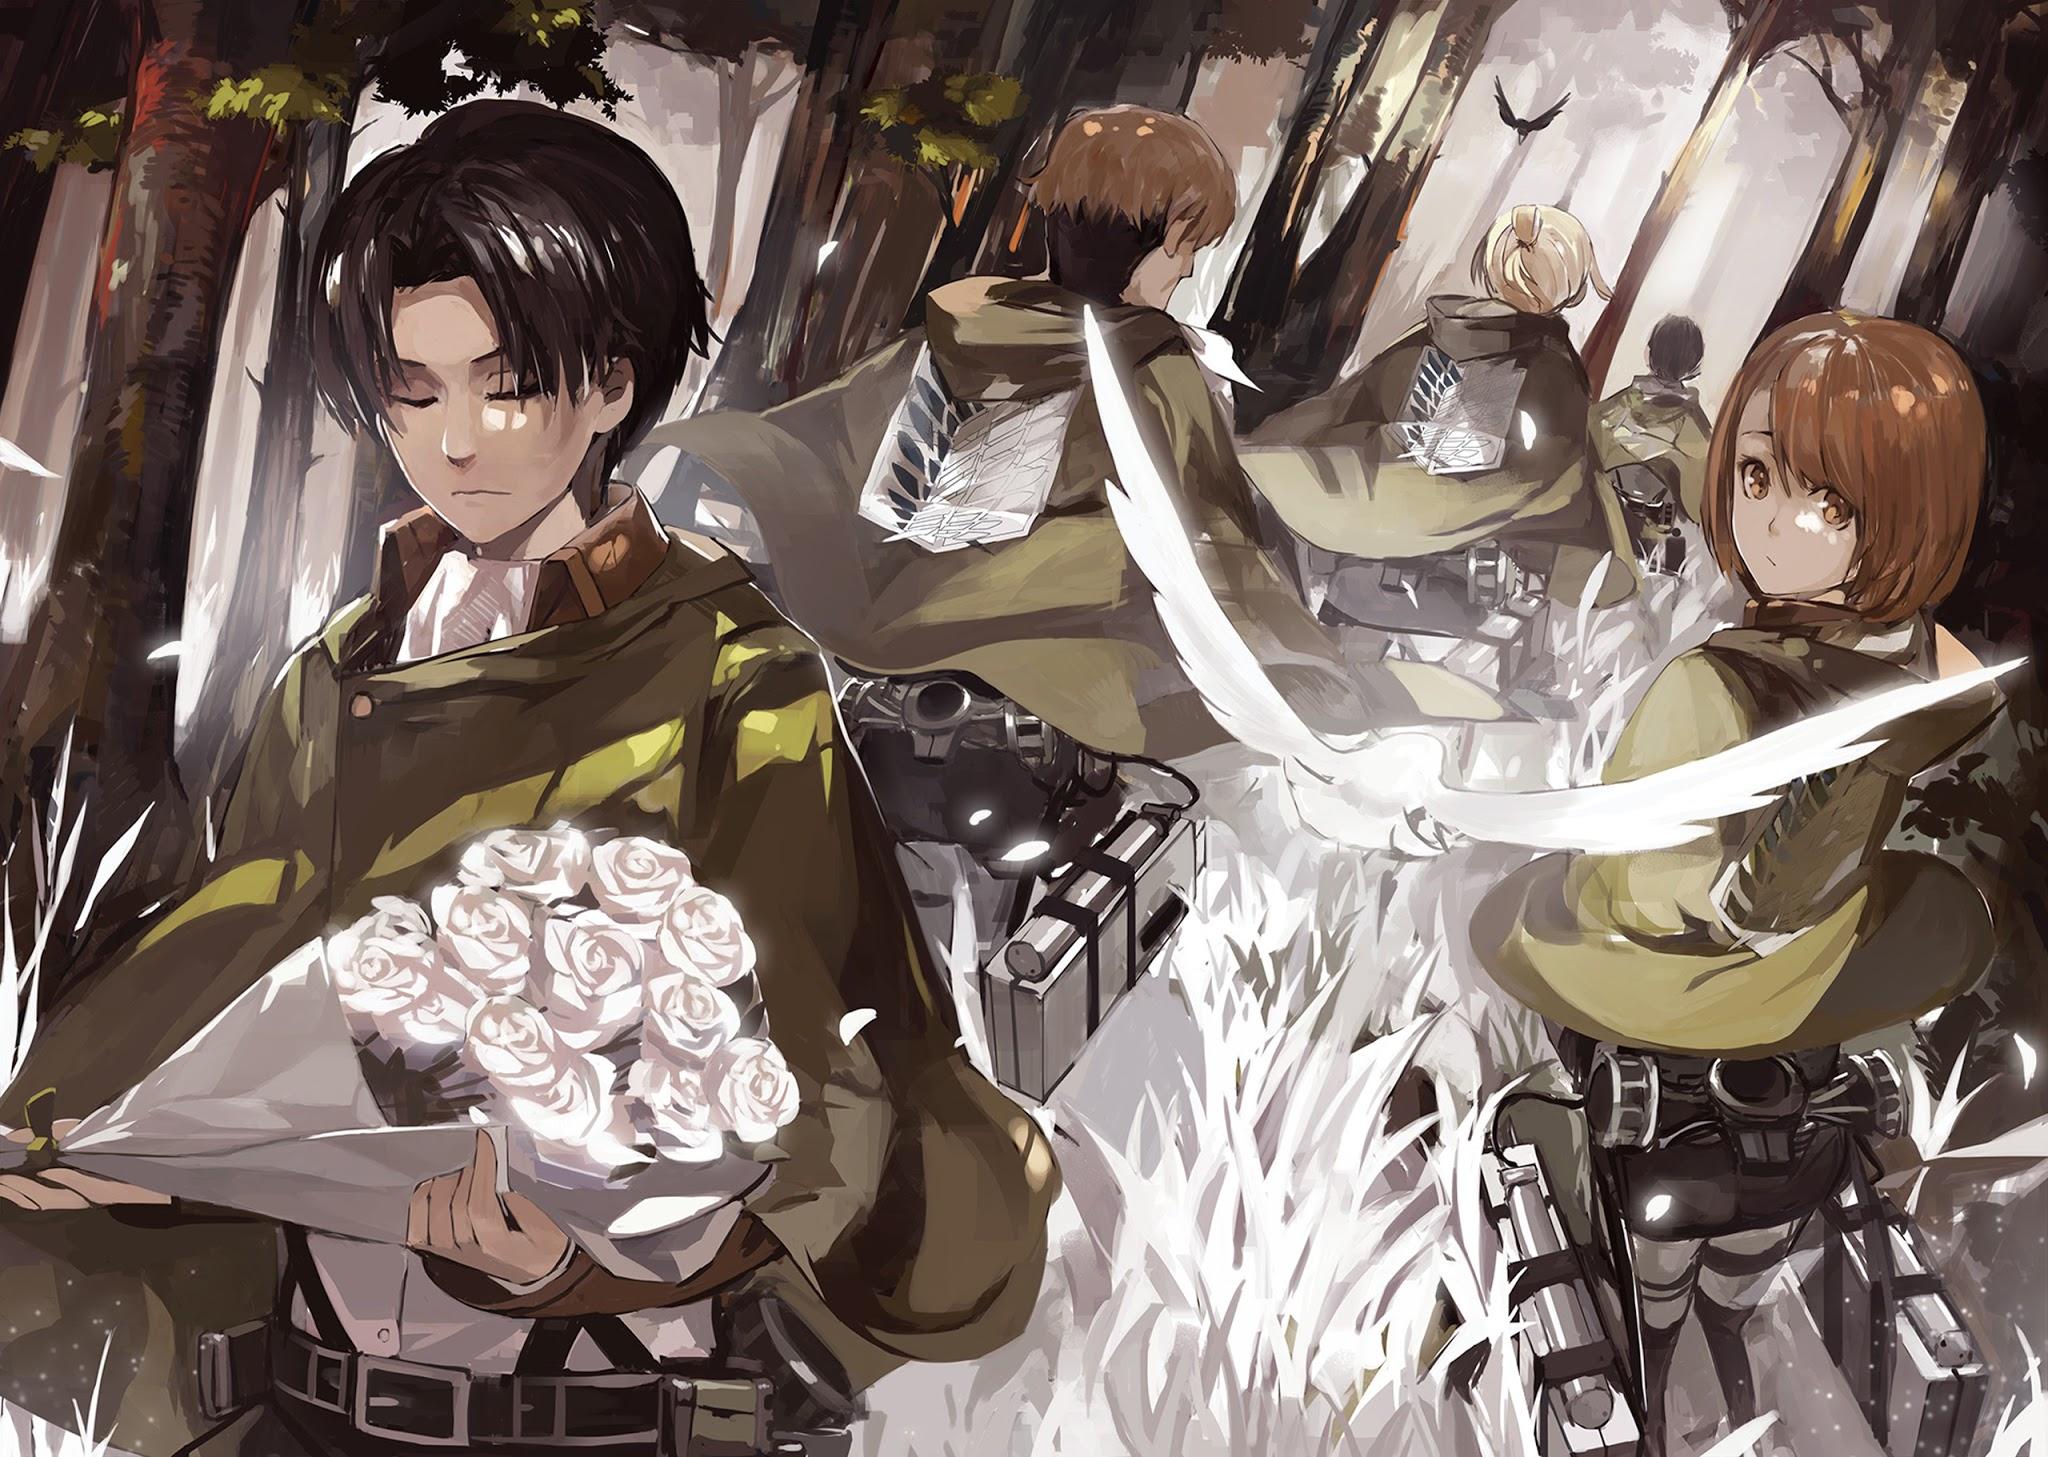 Scouting legion shingeki no kyojin attack on titan animal bird cape